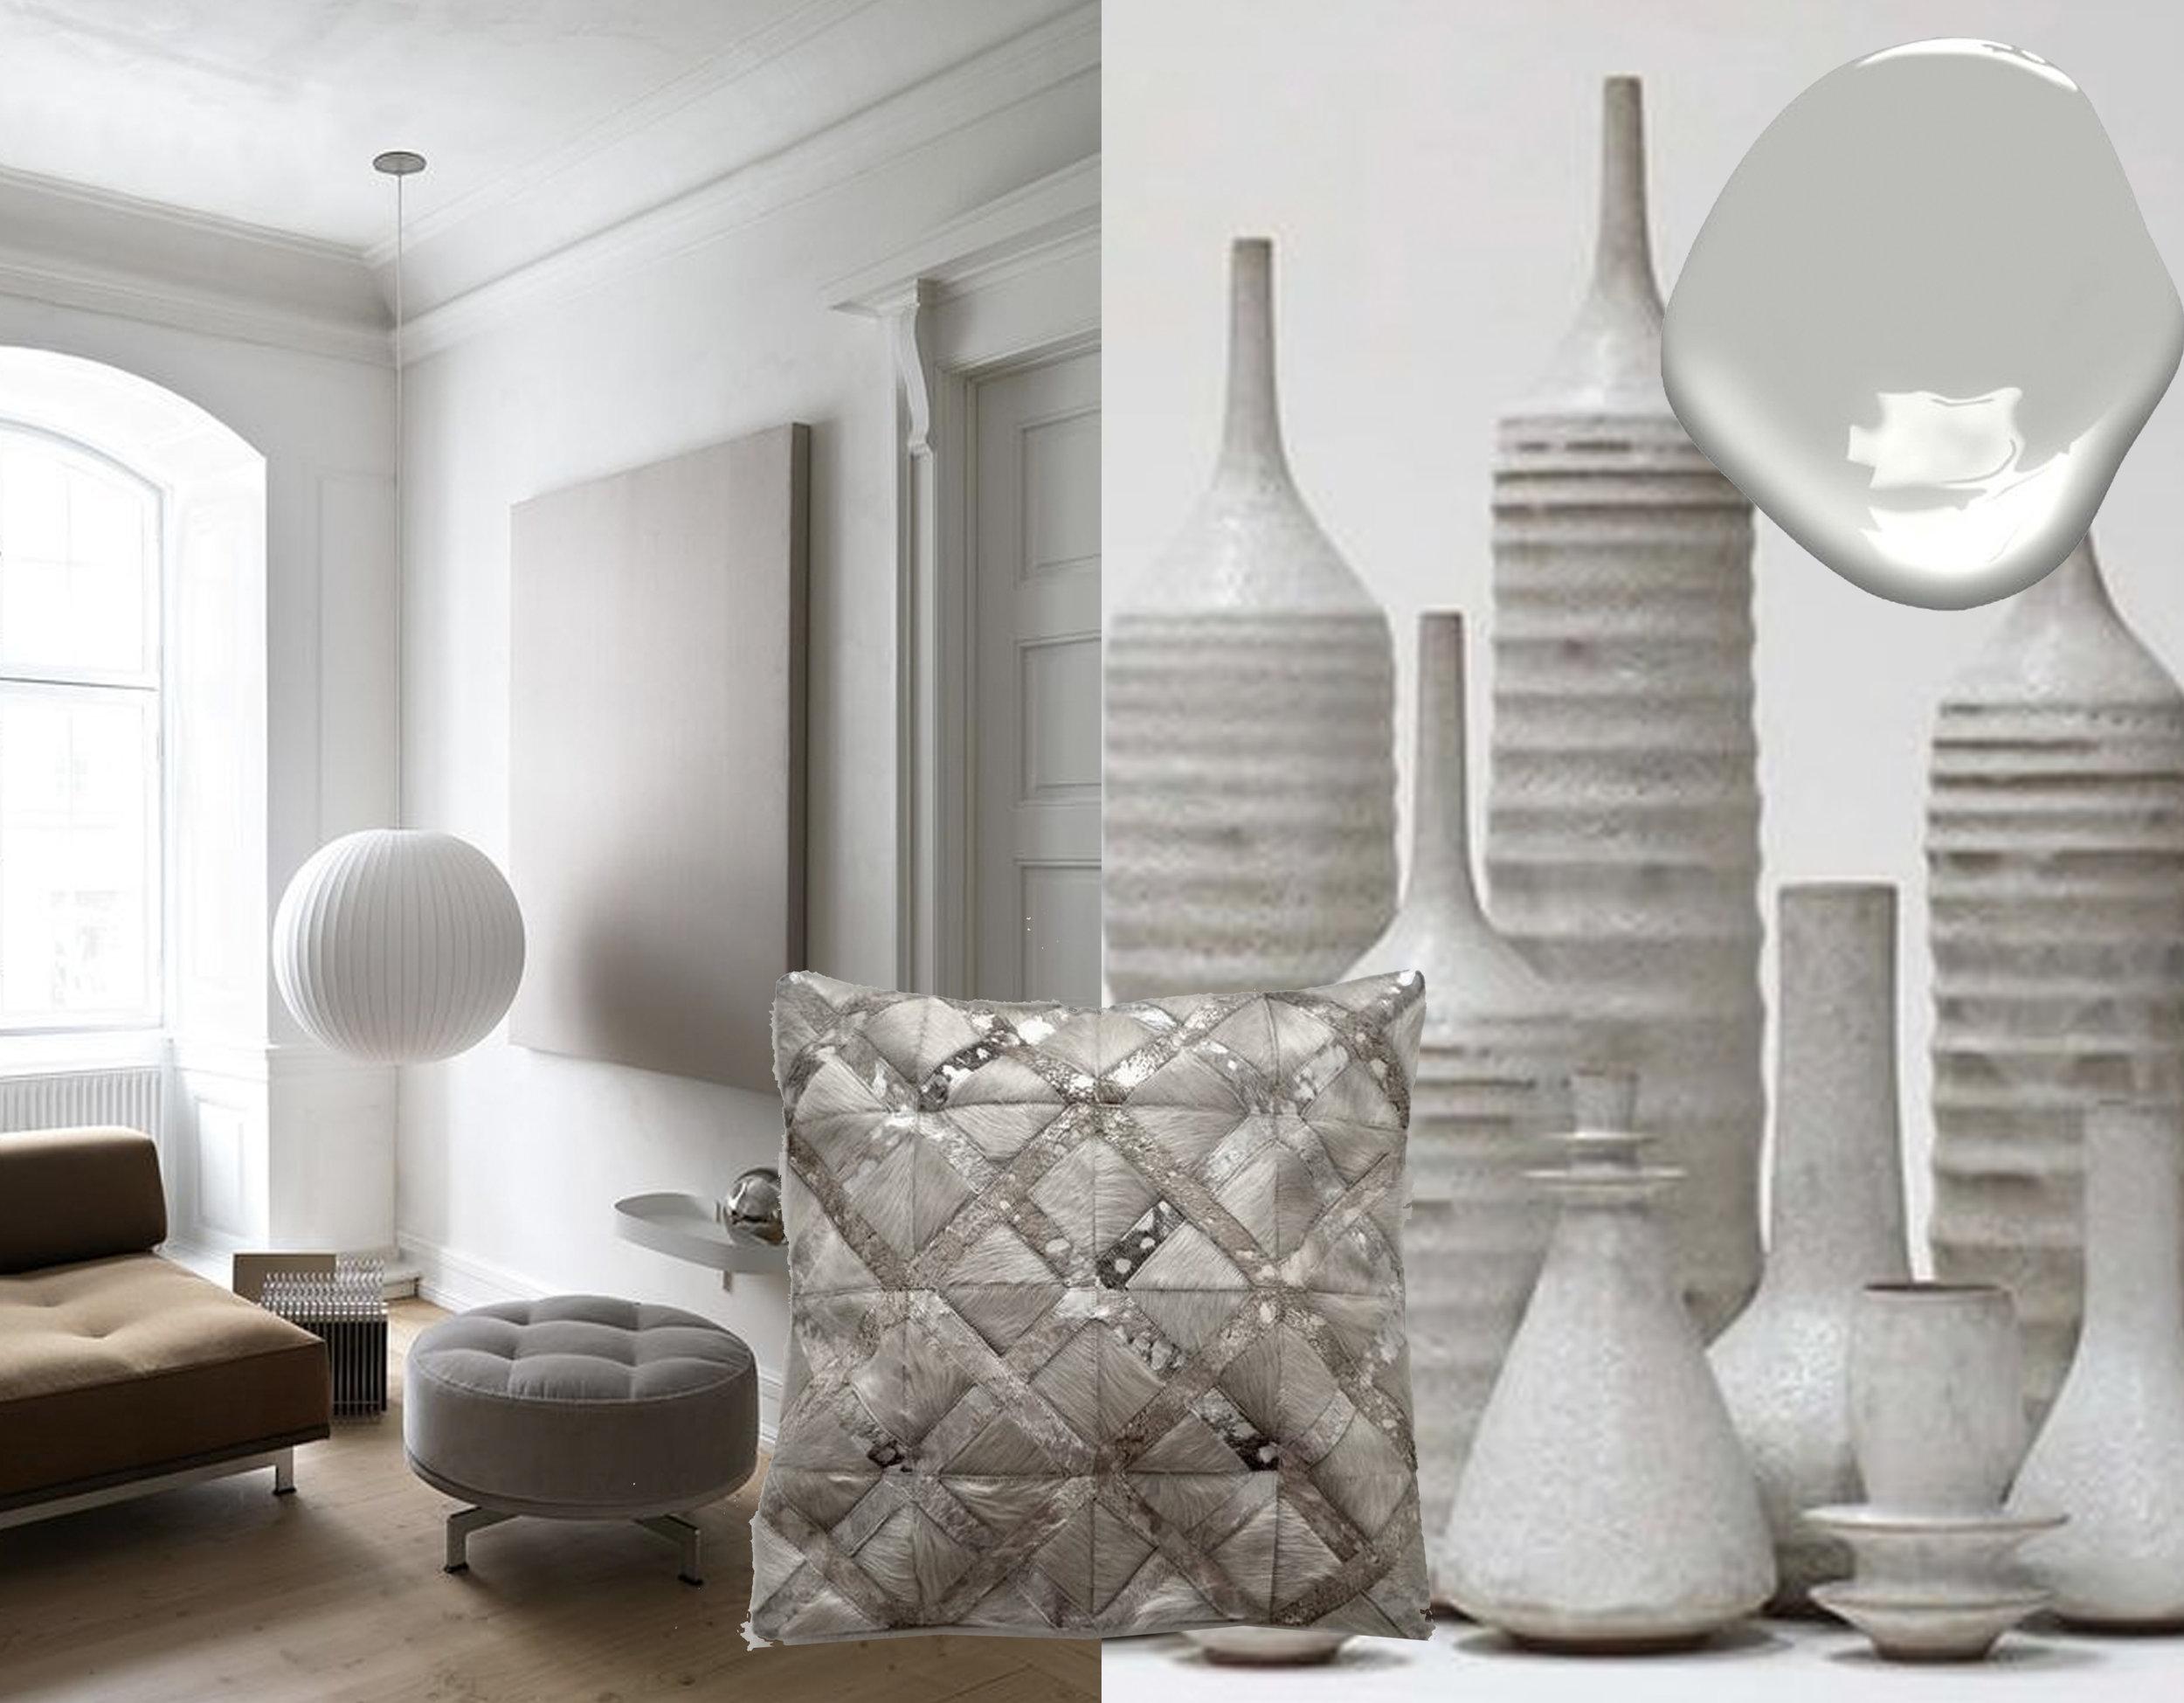 living room  - Stoneware ceramic bottles  Sara Paloma  - cowhide pillow  Life Style by Cara